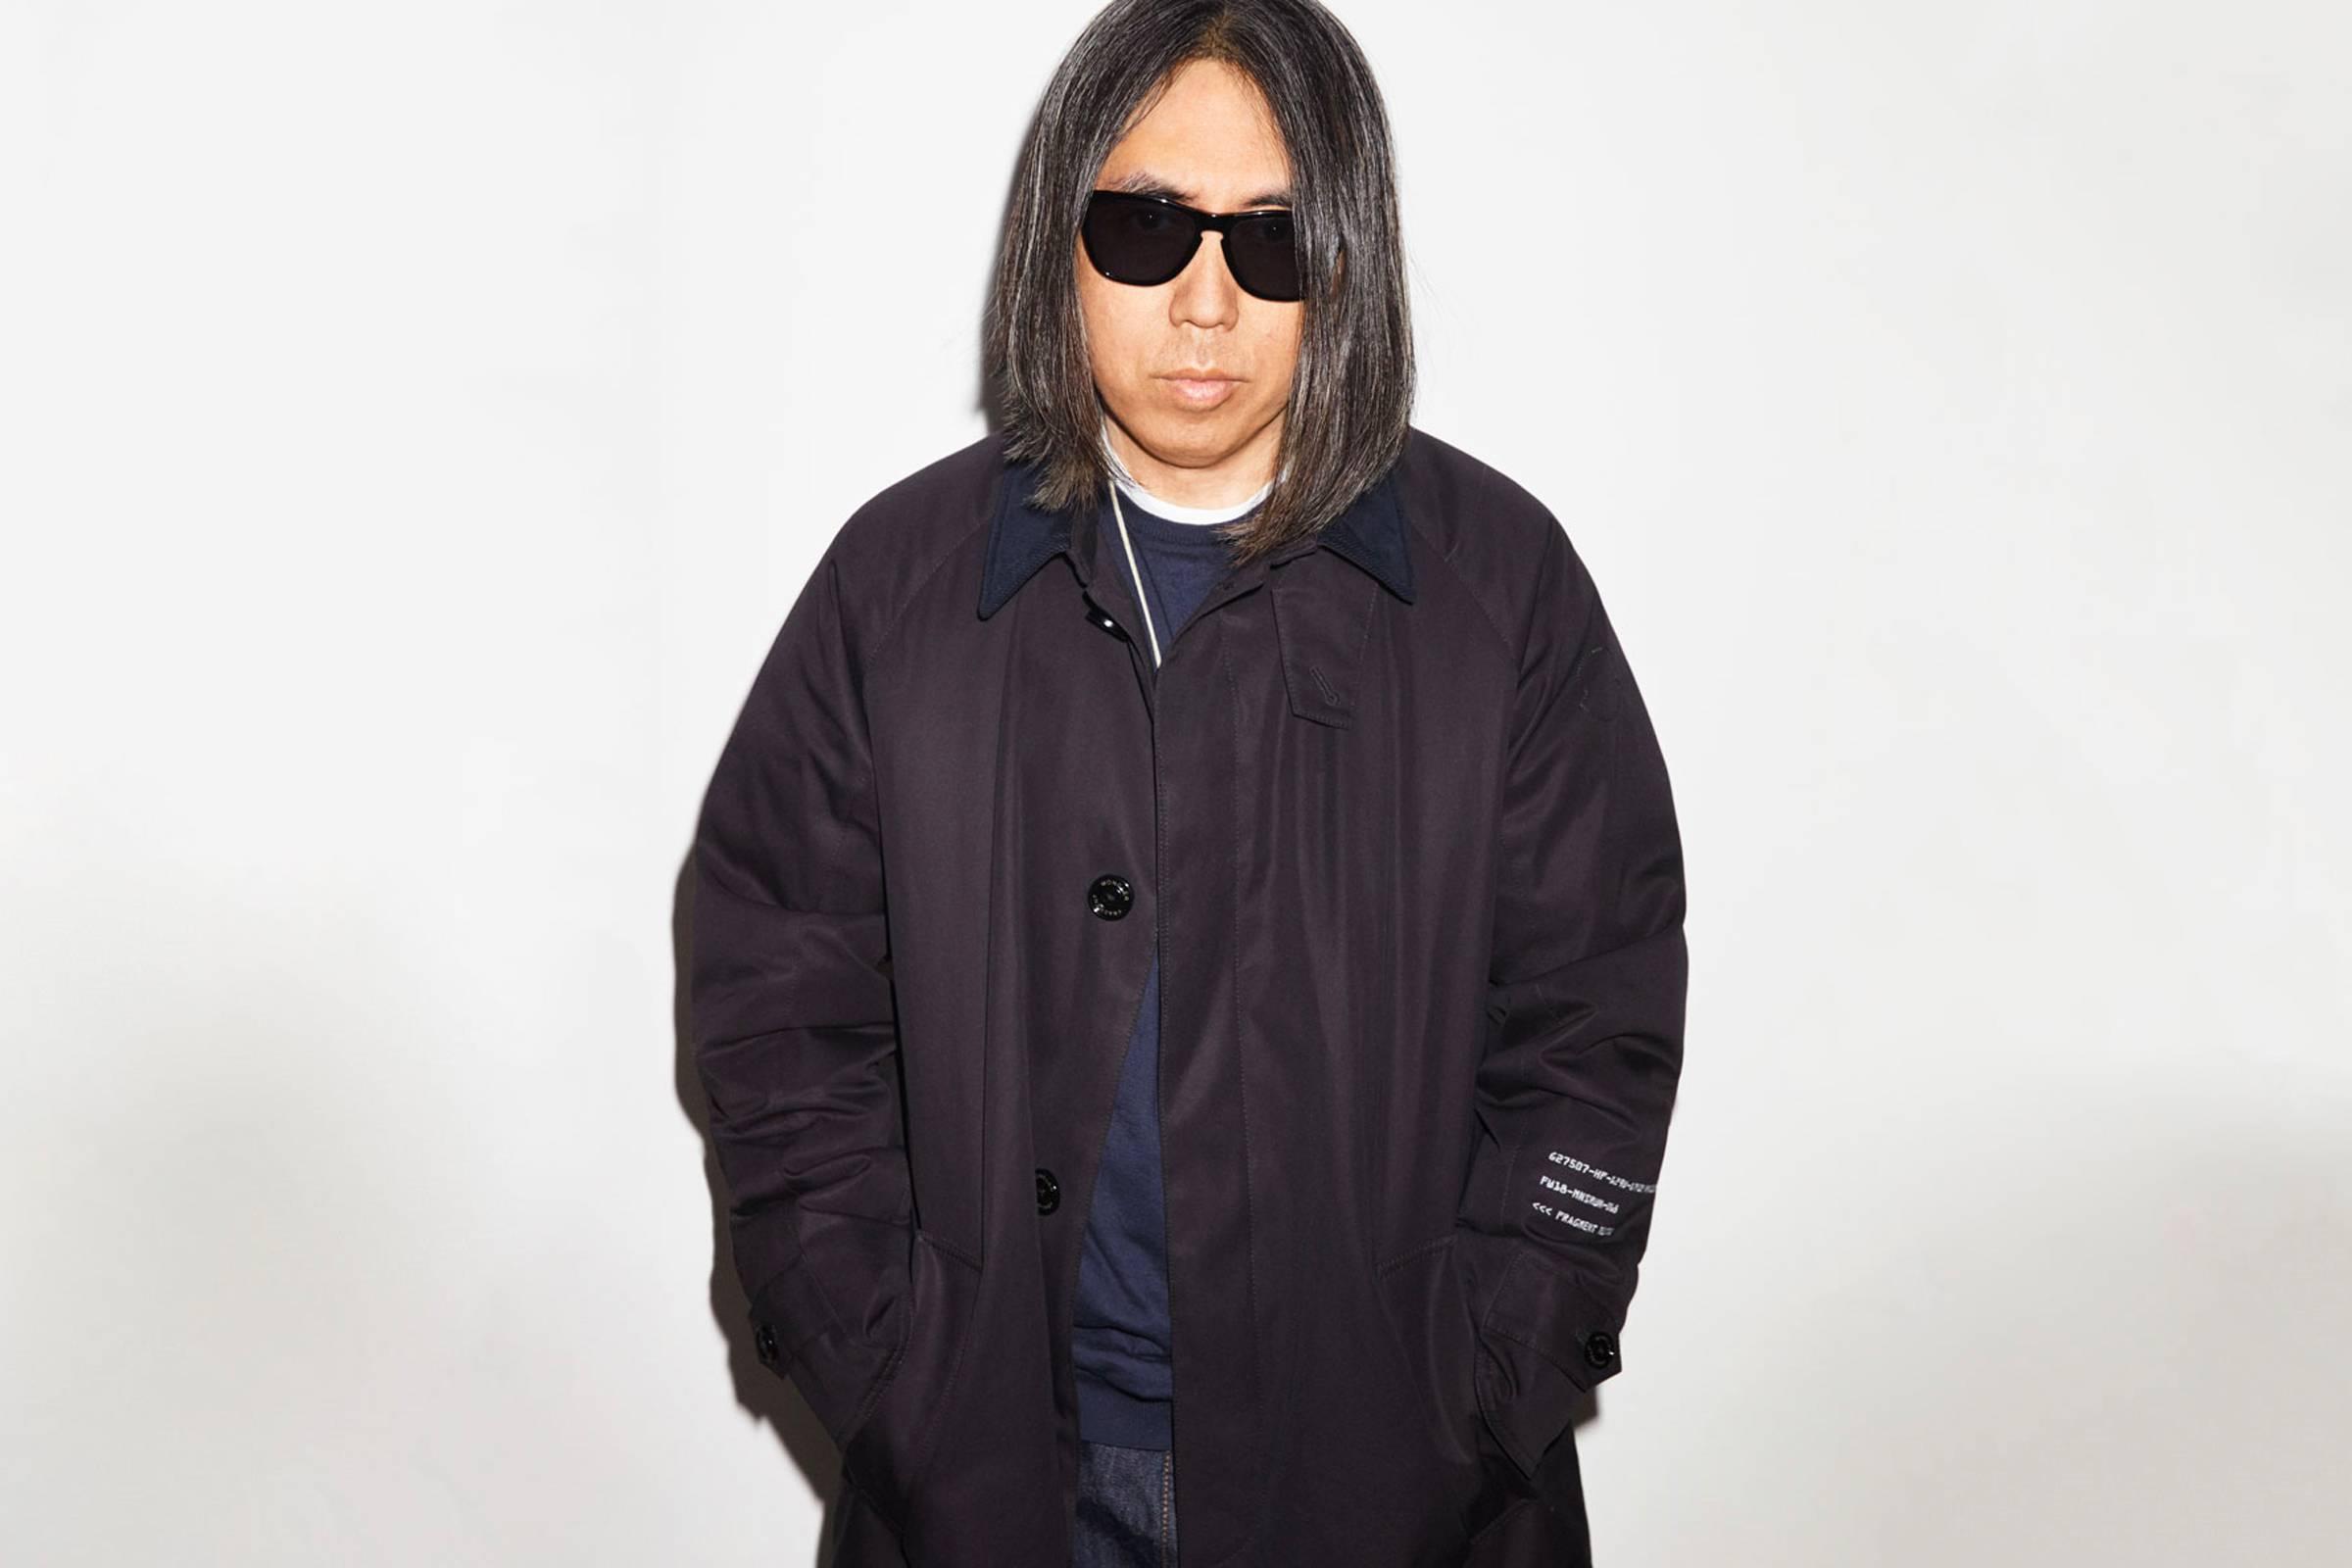 b841fe799a75 Godfather of Streetwear  The Life and Legacy of Hiroshi Fujiwara ...